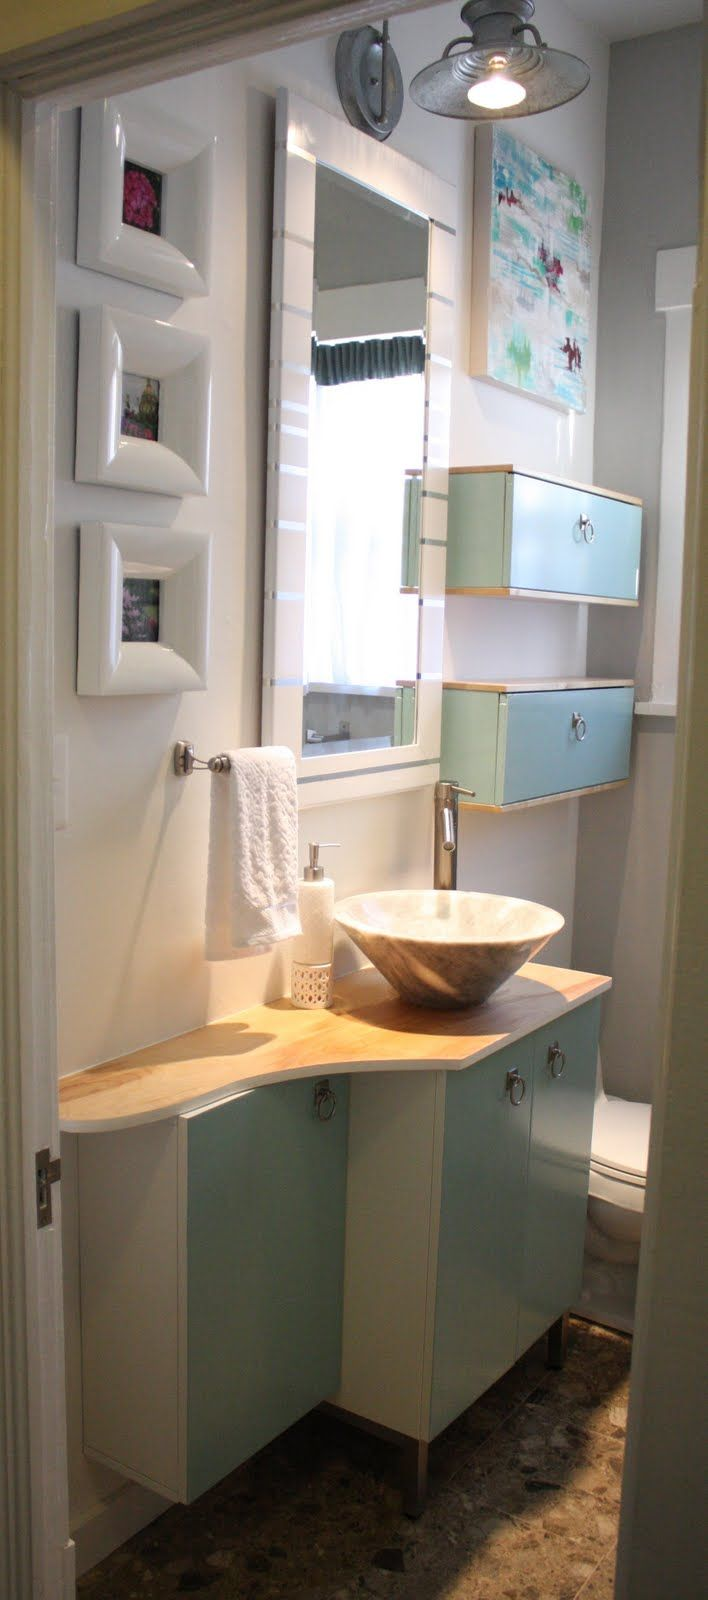 2 horizontal medicine cabinets